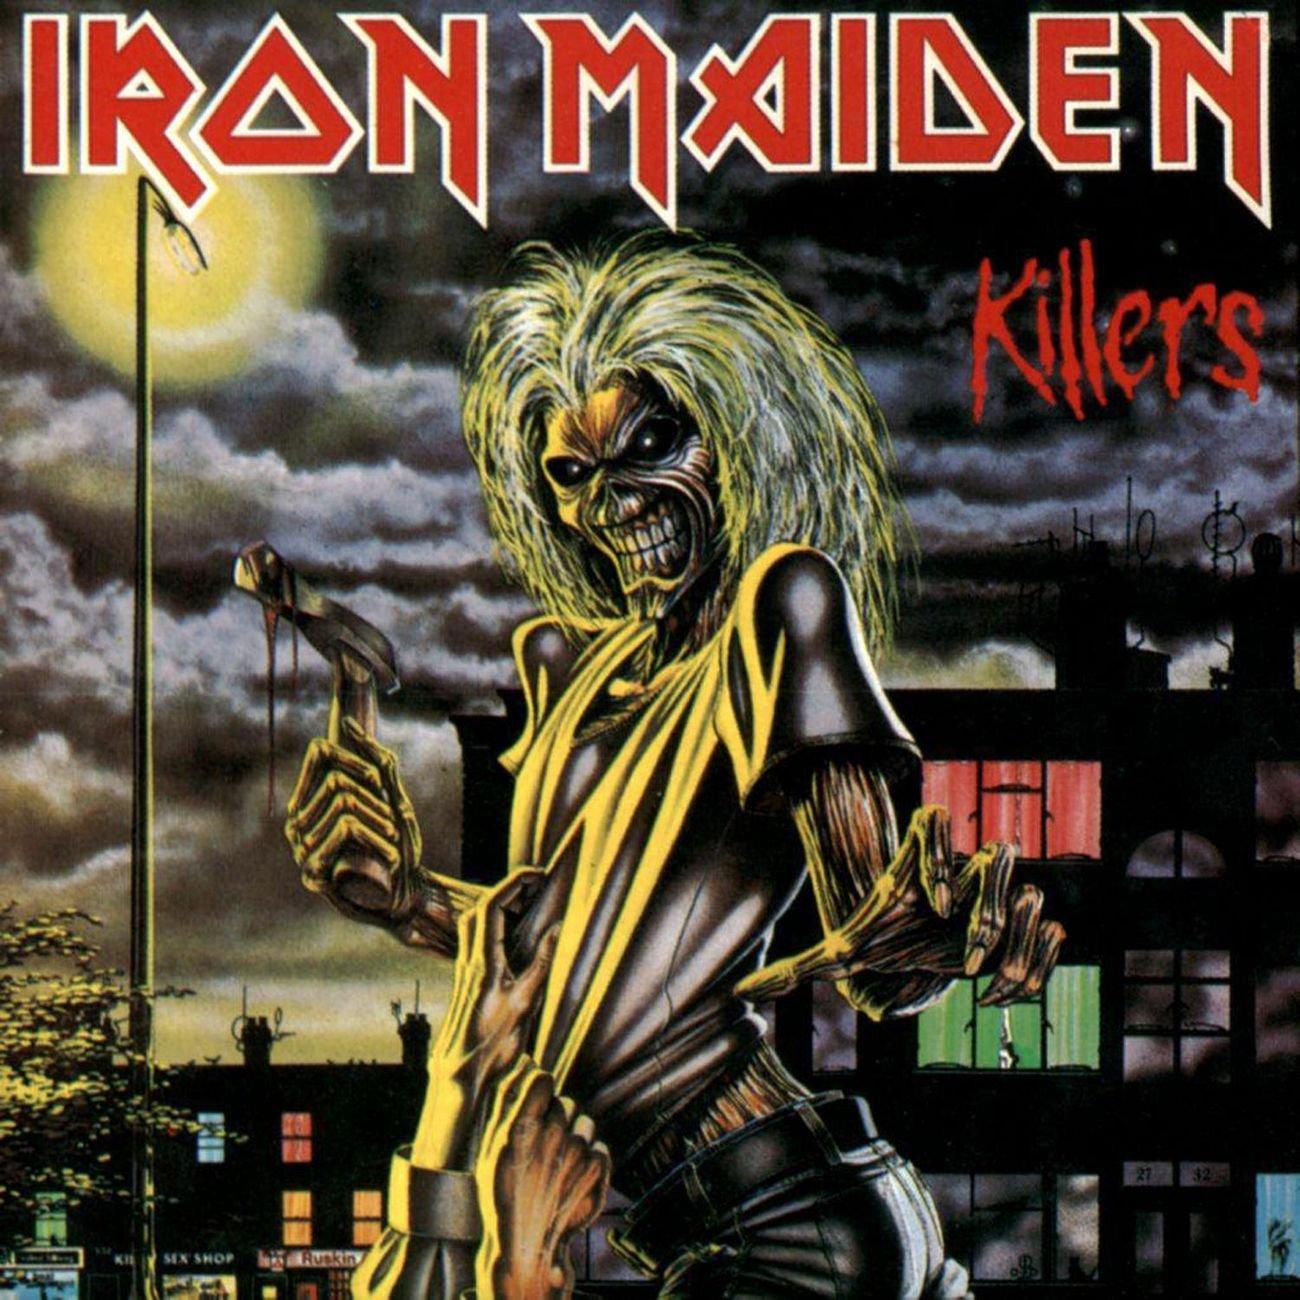 Killers: Iron Maiden: Amazon.es: Música